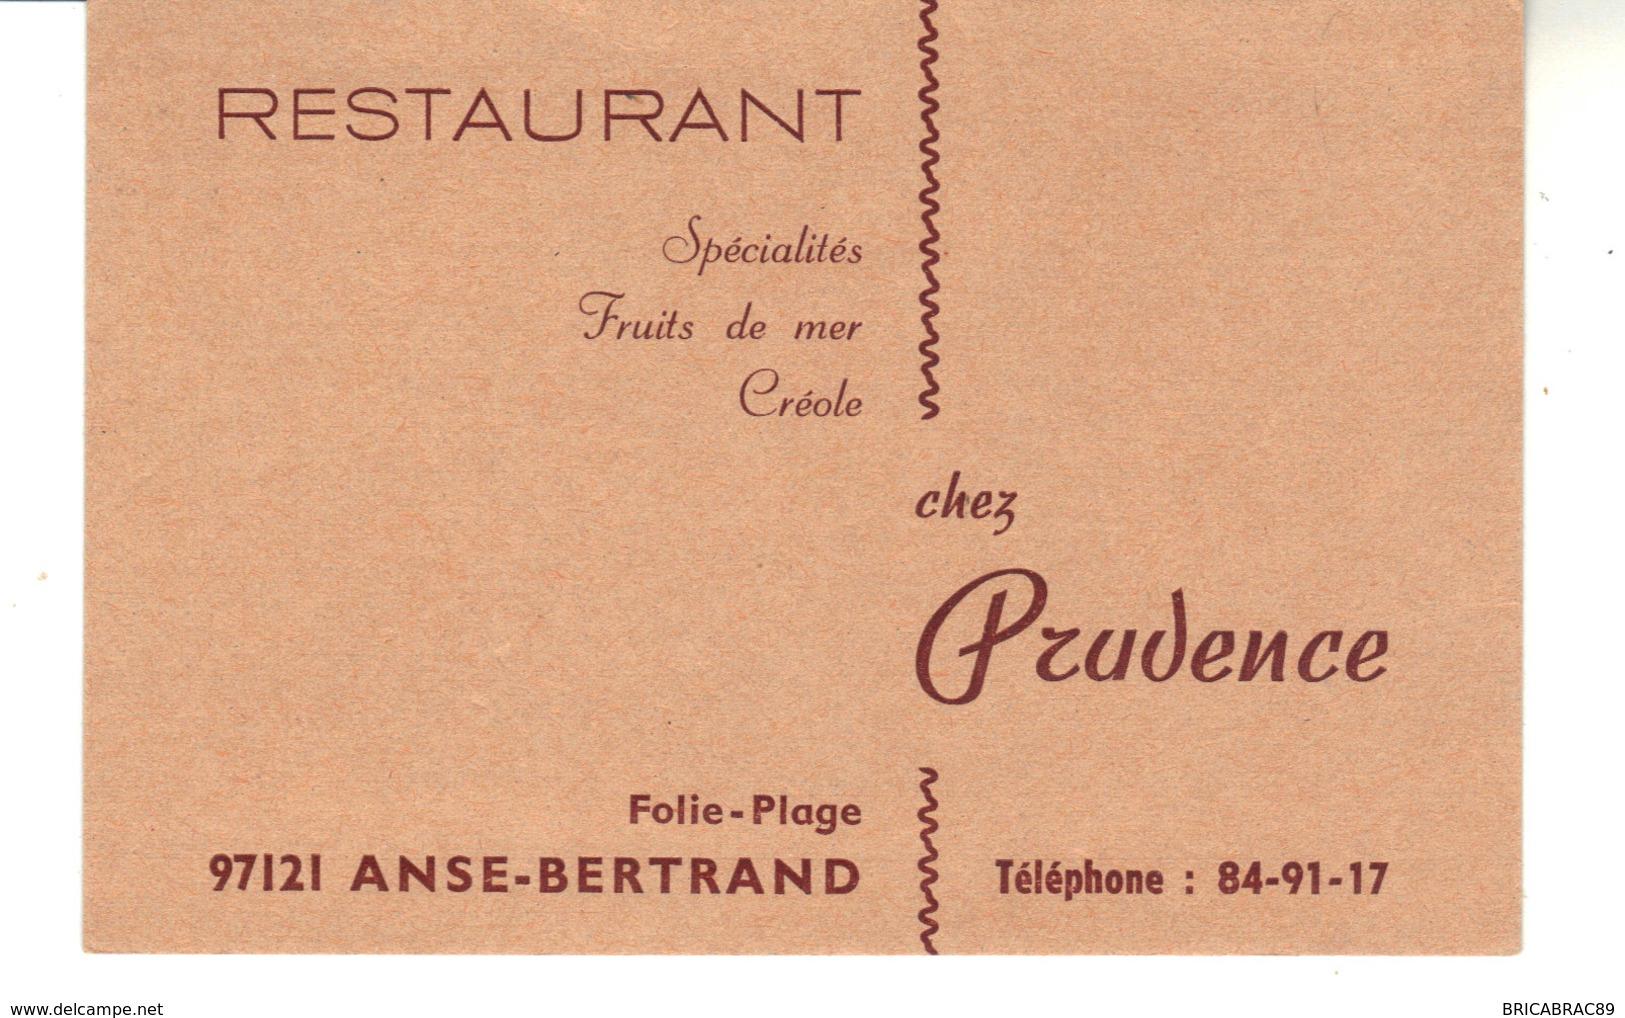 Carte De Visite  Restaurant  97121 Anse-Bertrand  Folie Plage   Chez Prudence - Visiting Cards